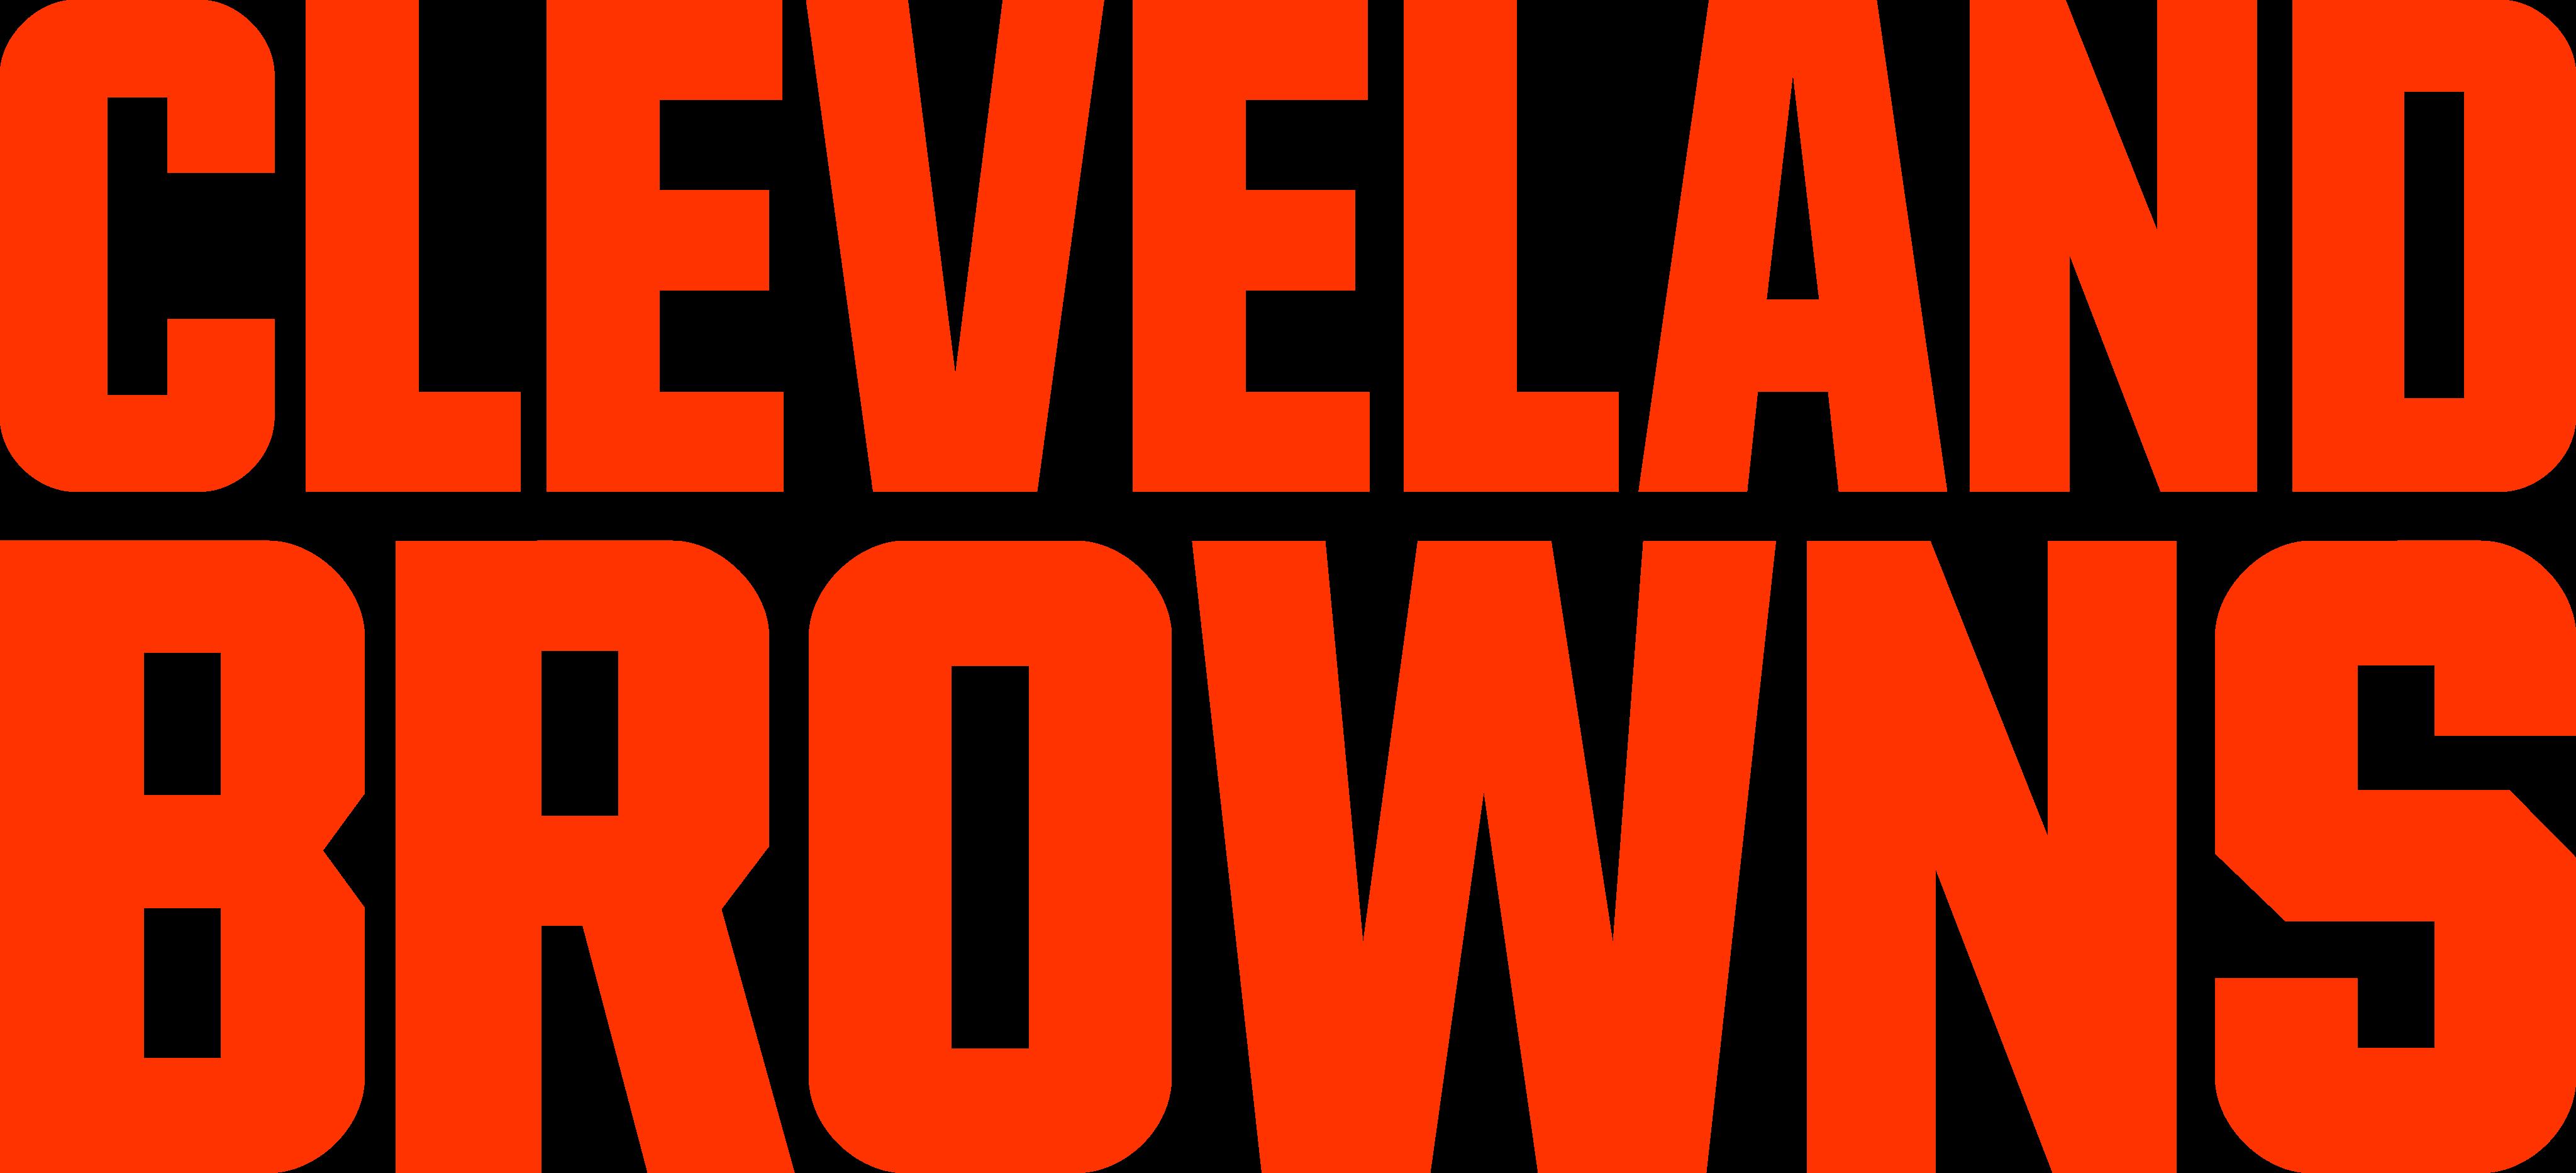 cleveland browns logo 1 - Cleveland Browns Logo